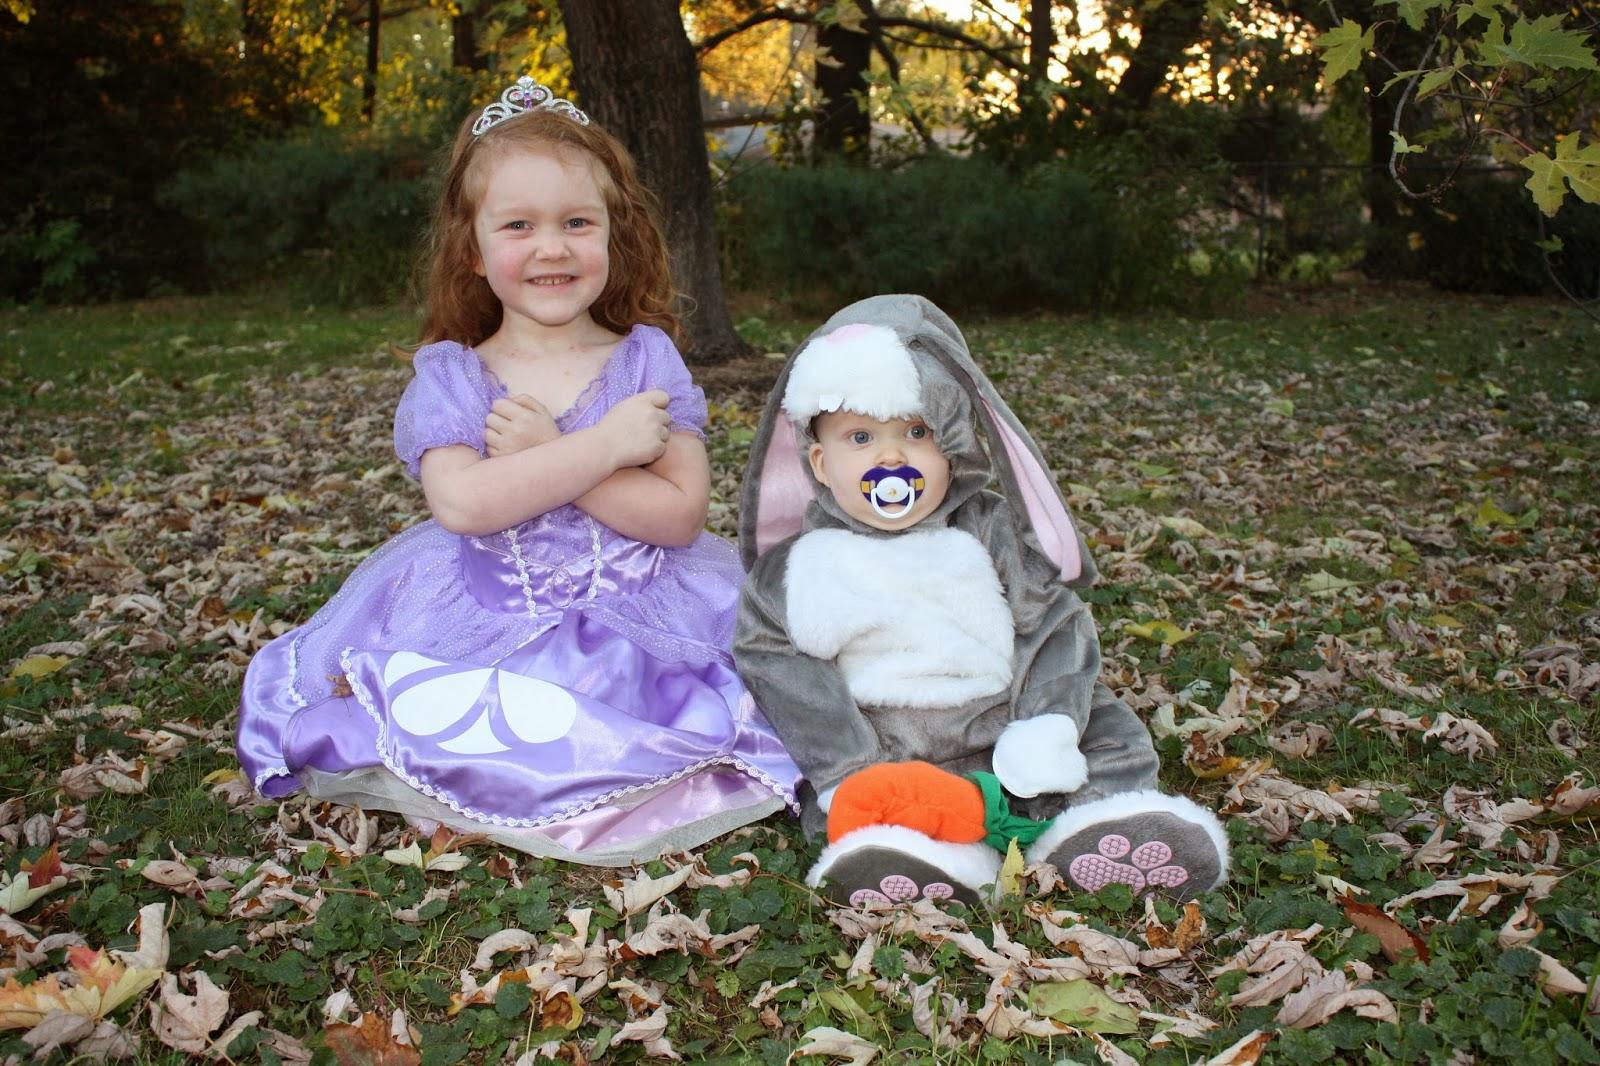 sofia the 1st halloween costume ✓ halloween